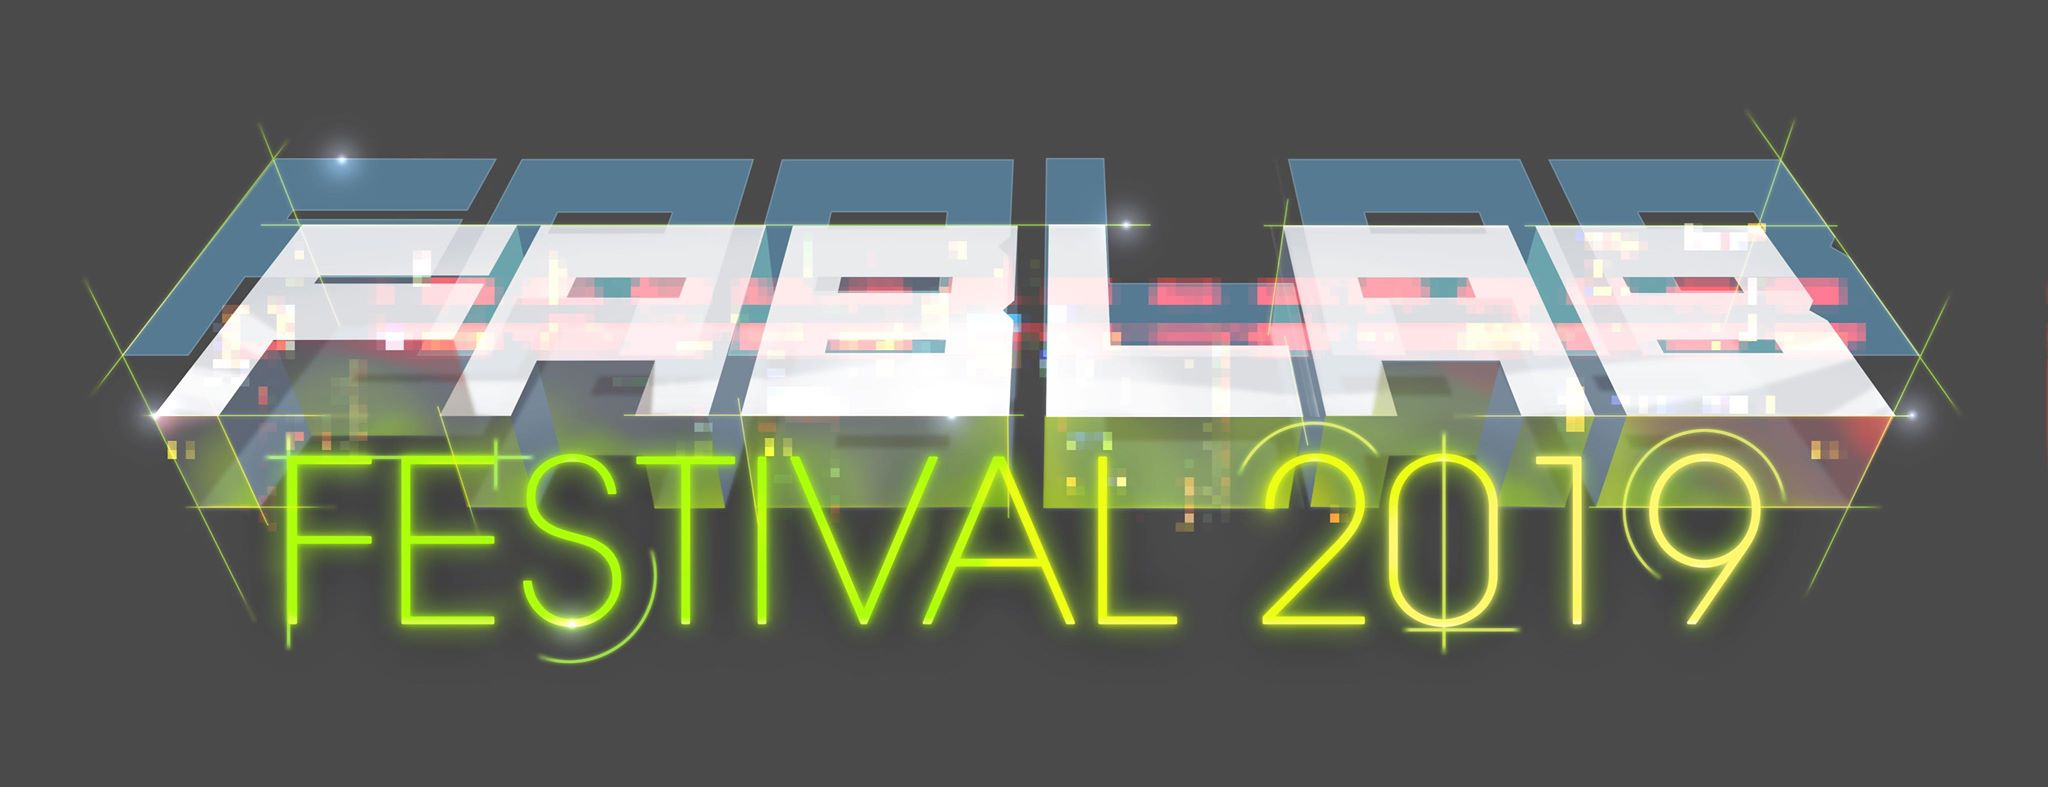 FabLab Festival 2019 du 23 au 26 Mai